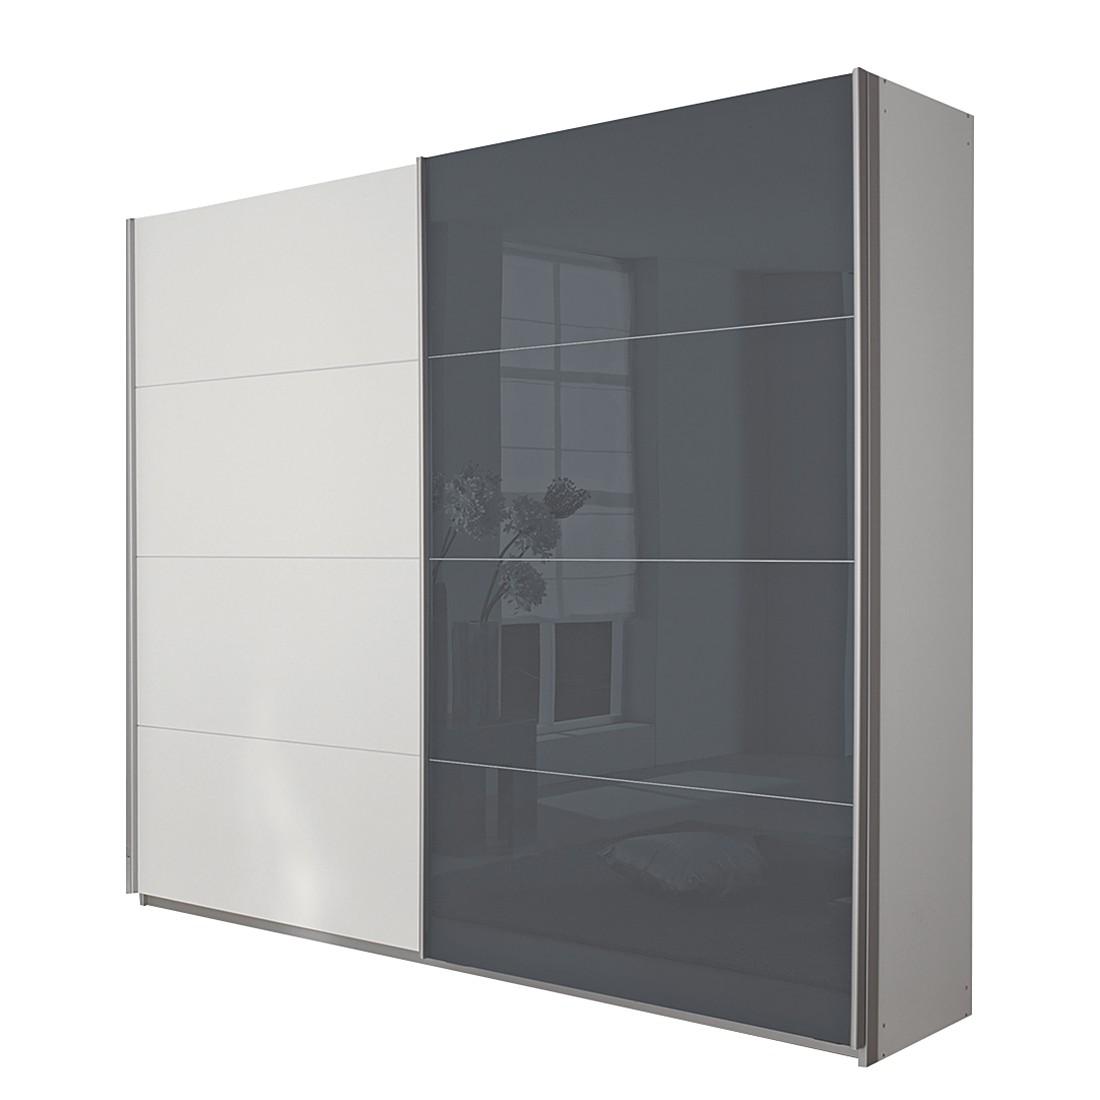 goedkoop Schuifdeurkast Quadra alpinewit grijs 136cm 2 deurs 210cm Rauch Packs